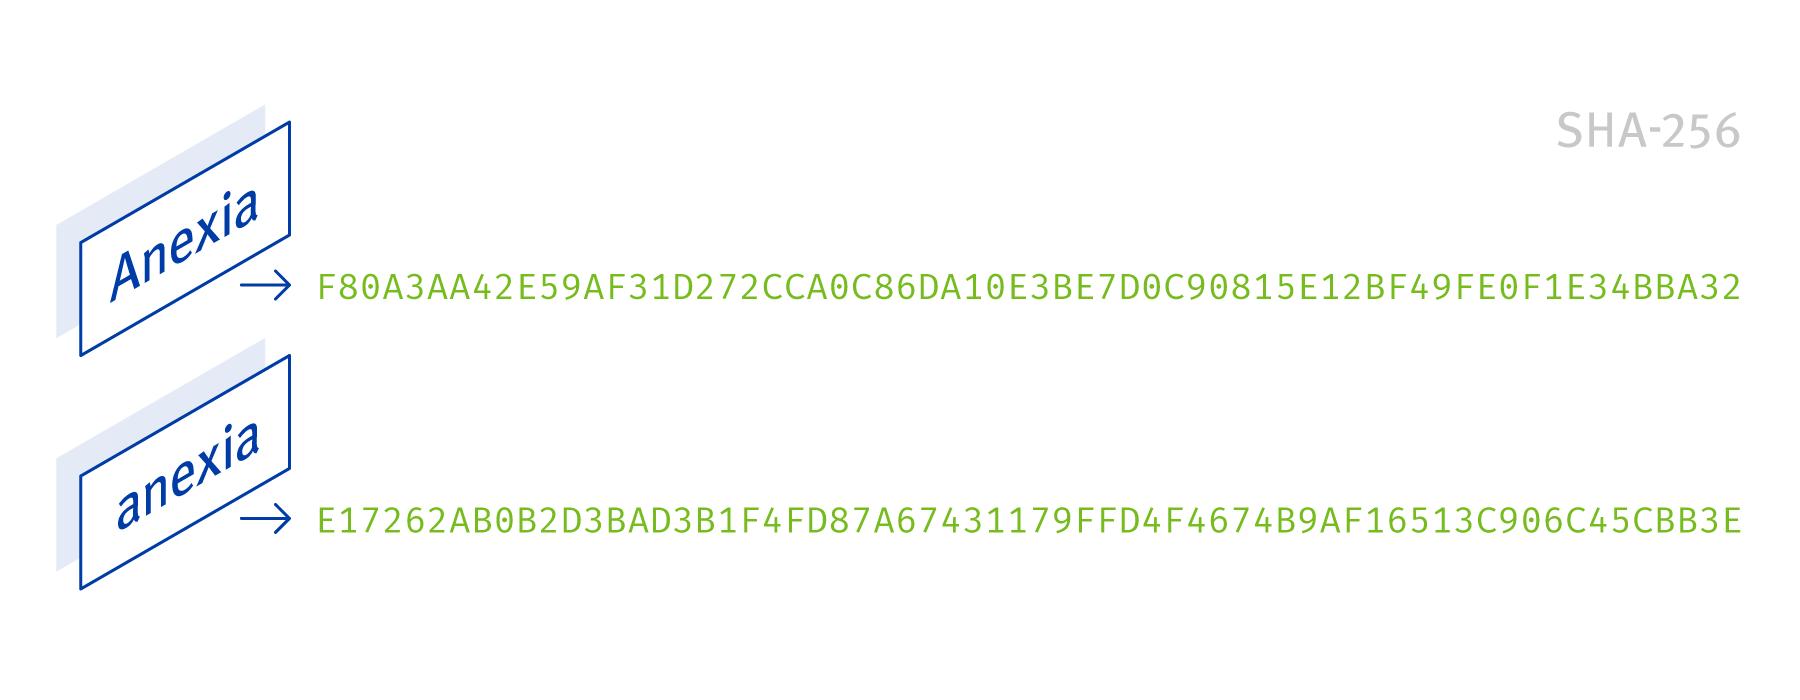 Blockchain hash function